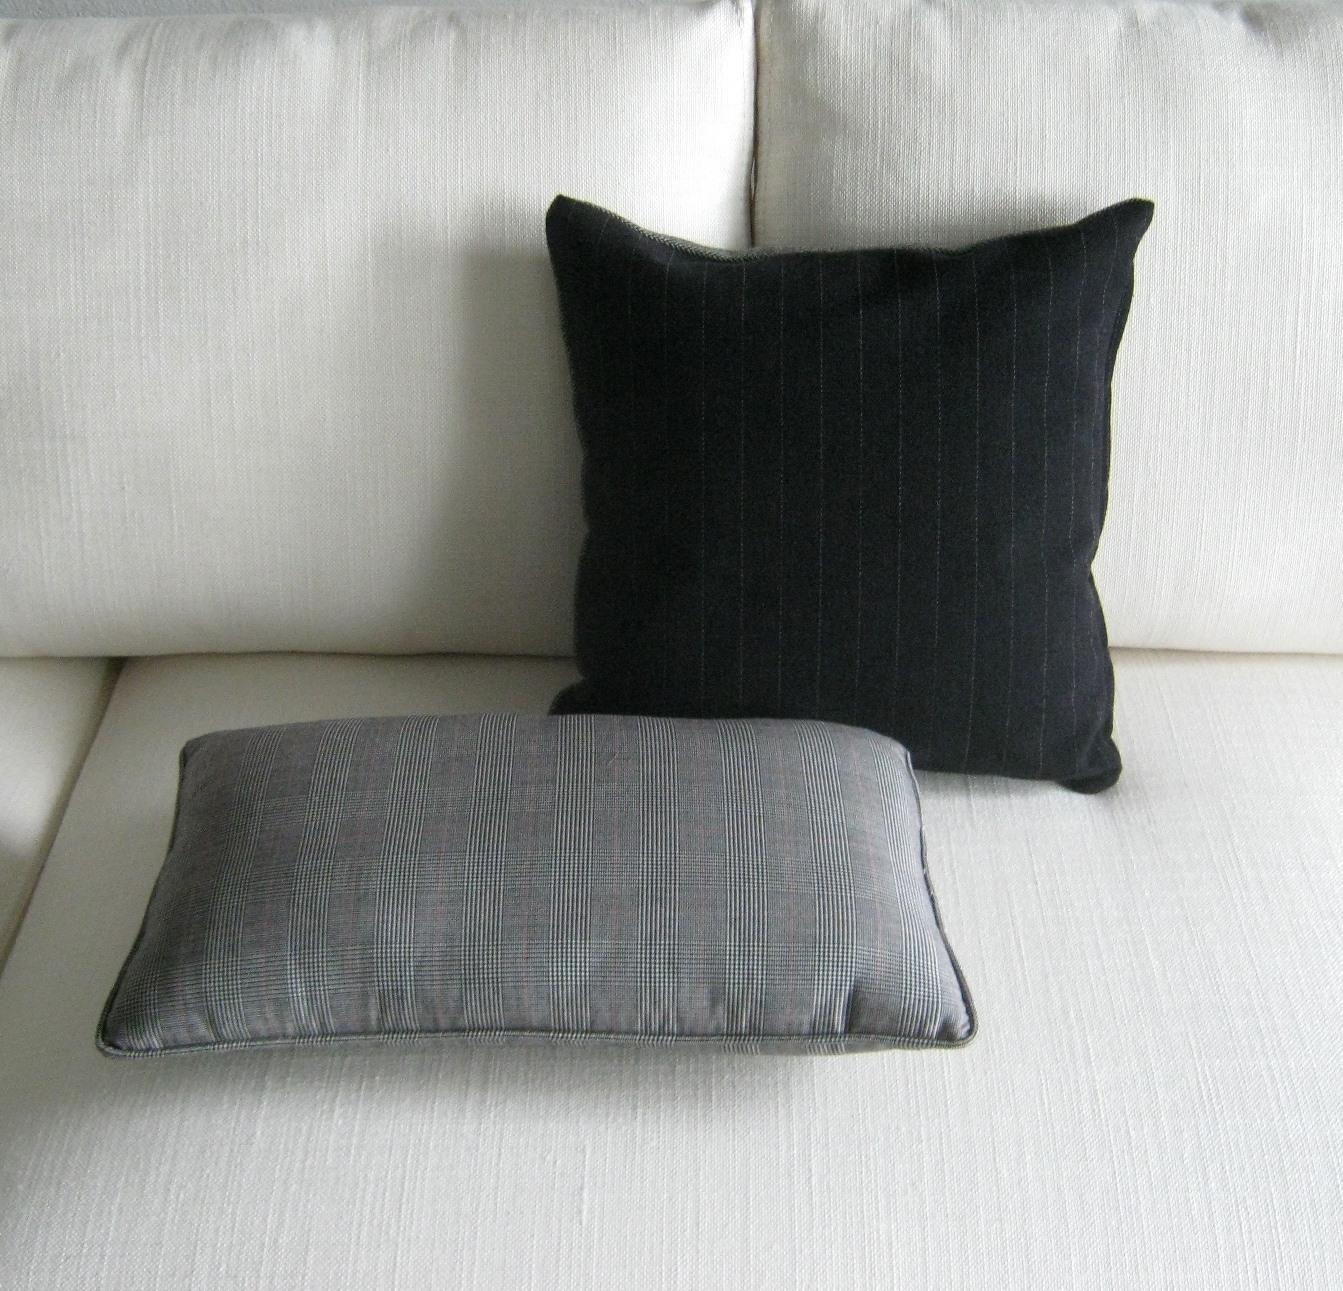 Ikea cuscini divano idee per la casa for Cuscini per cani ikea